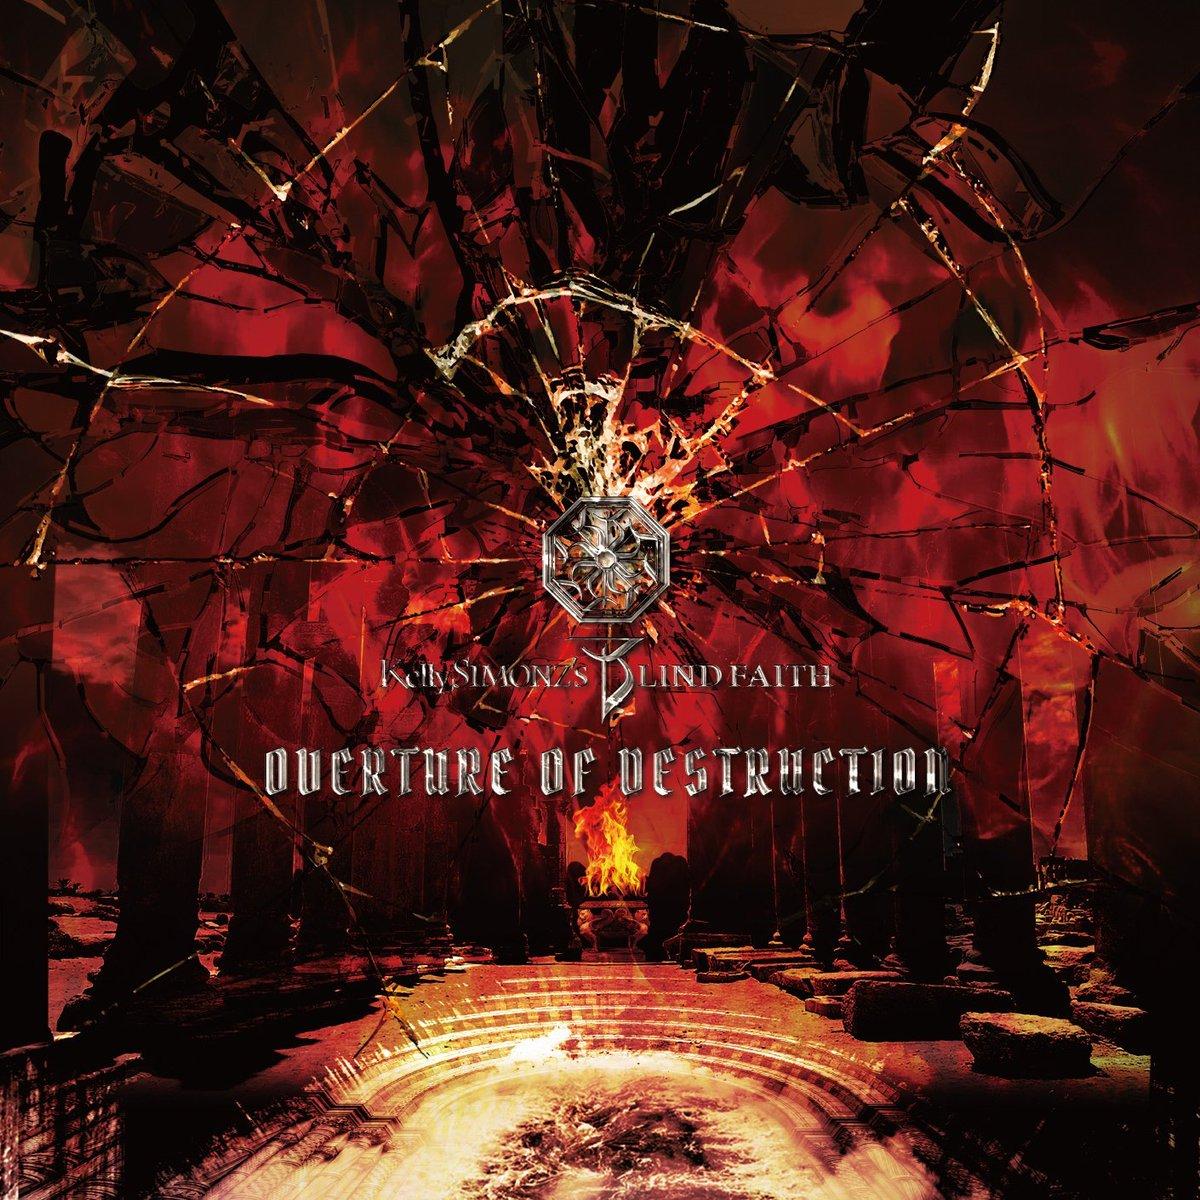 KELLY SIMONZ'S BLIND FAITH - Overture of Destruction cover